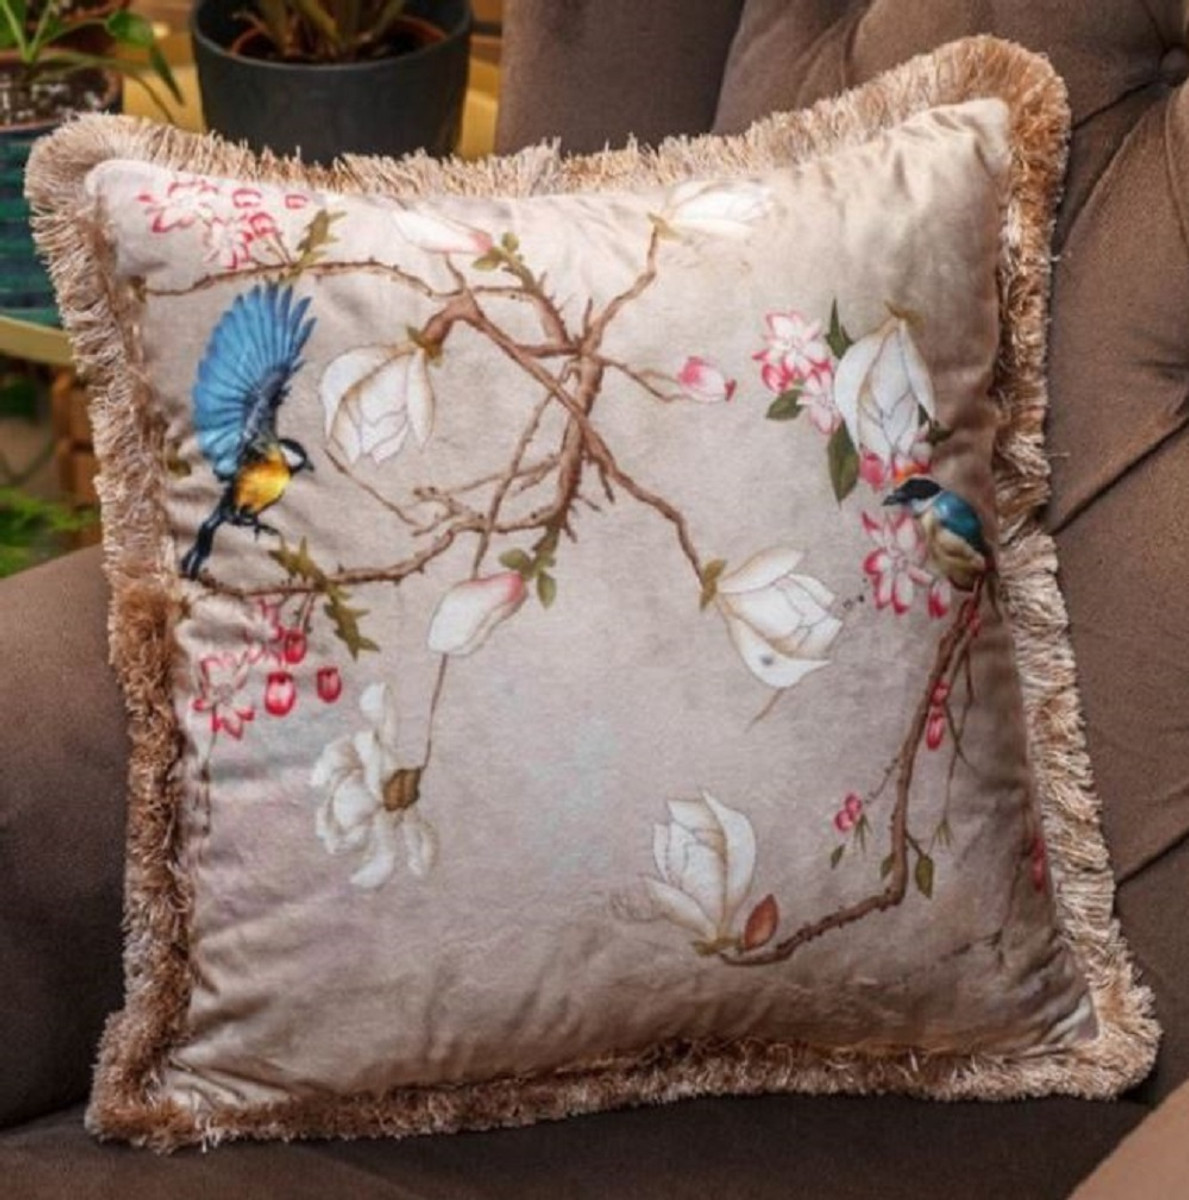 Casa Padrino Luxury Decorative Pillow Birds Beige Multicolor 45 X 45 Cm Printed Velvet Pillow With Fringes Living Room Decoration Accessories